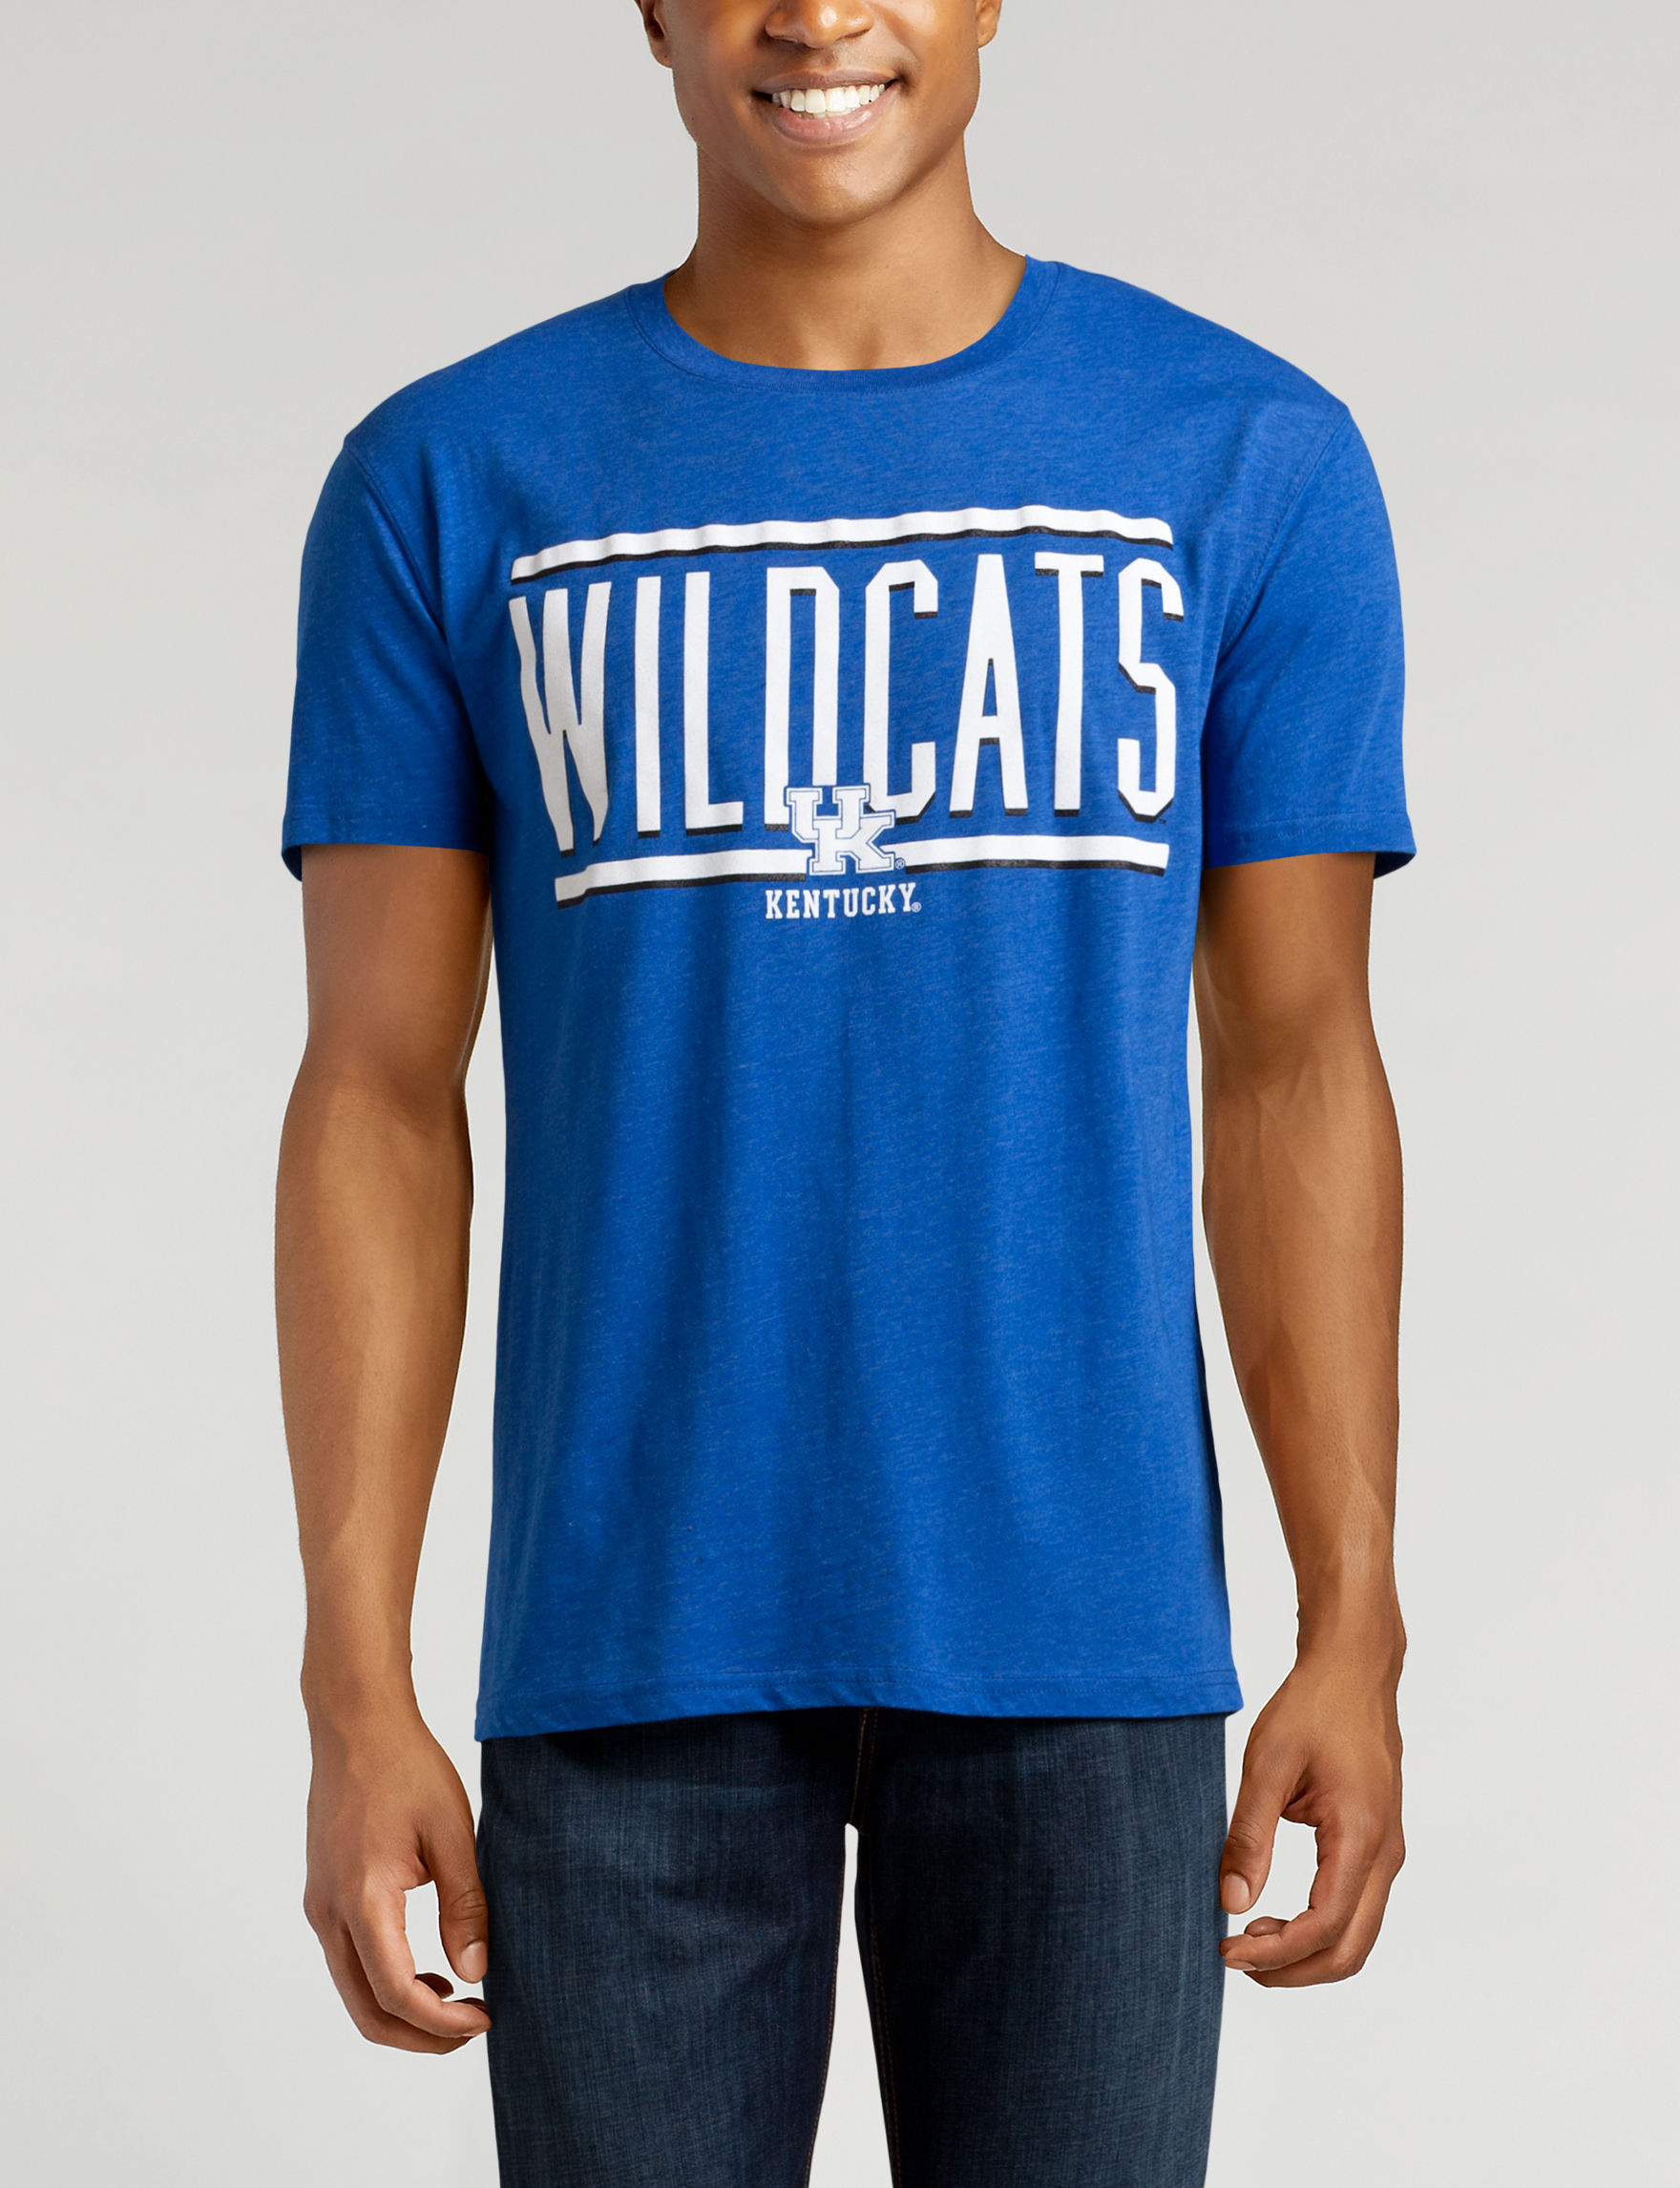 NCAA Royal Blue Tees & Tanks